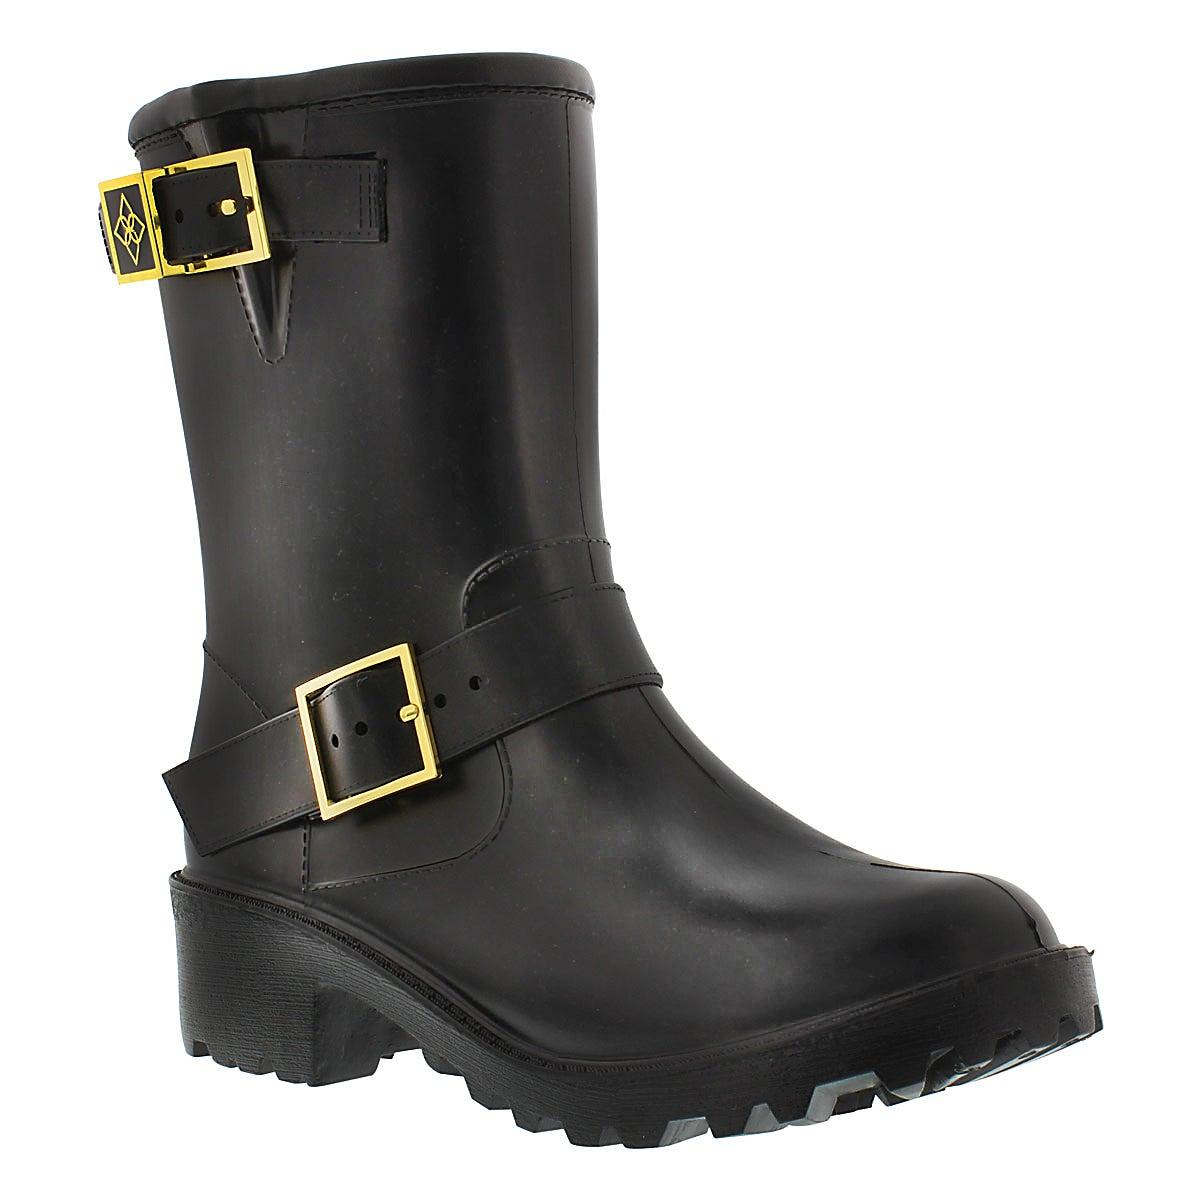 Lds Liverpool blk buckle rain boot